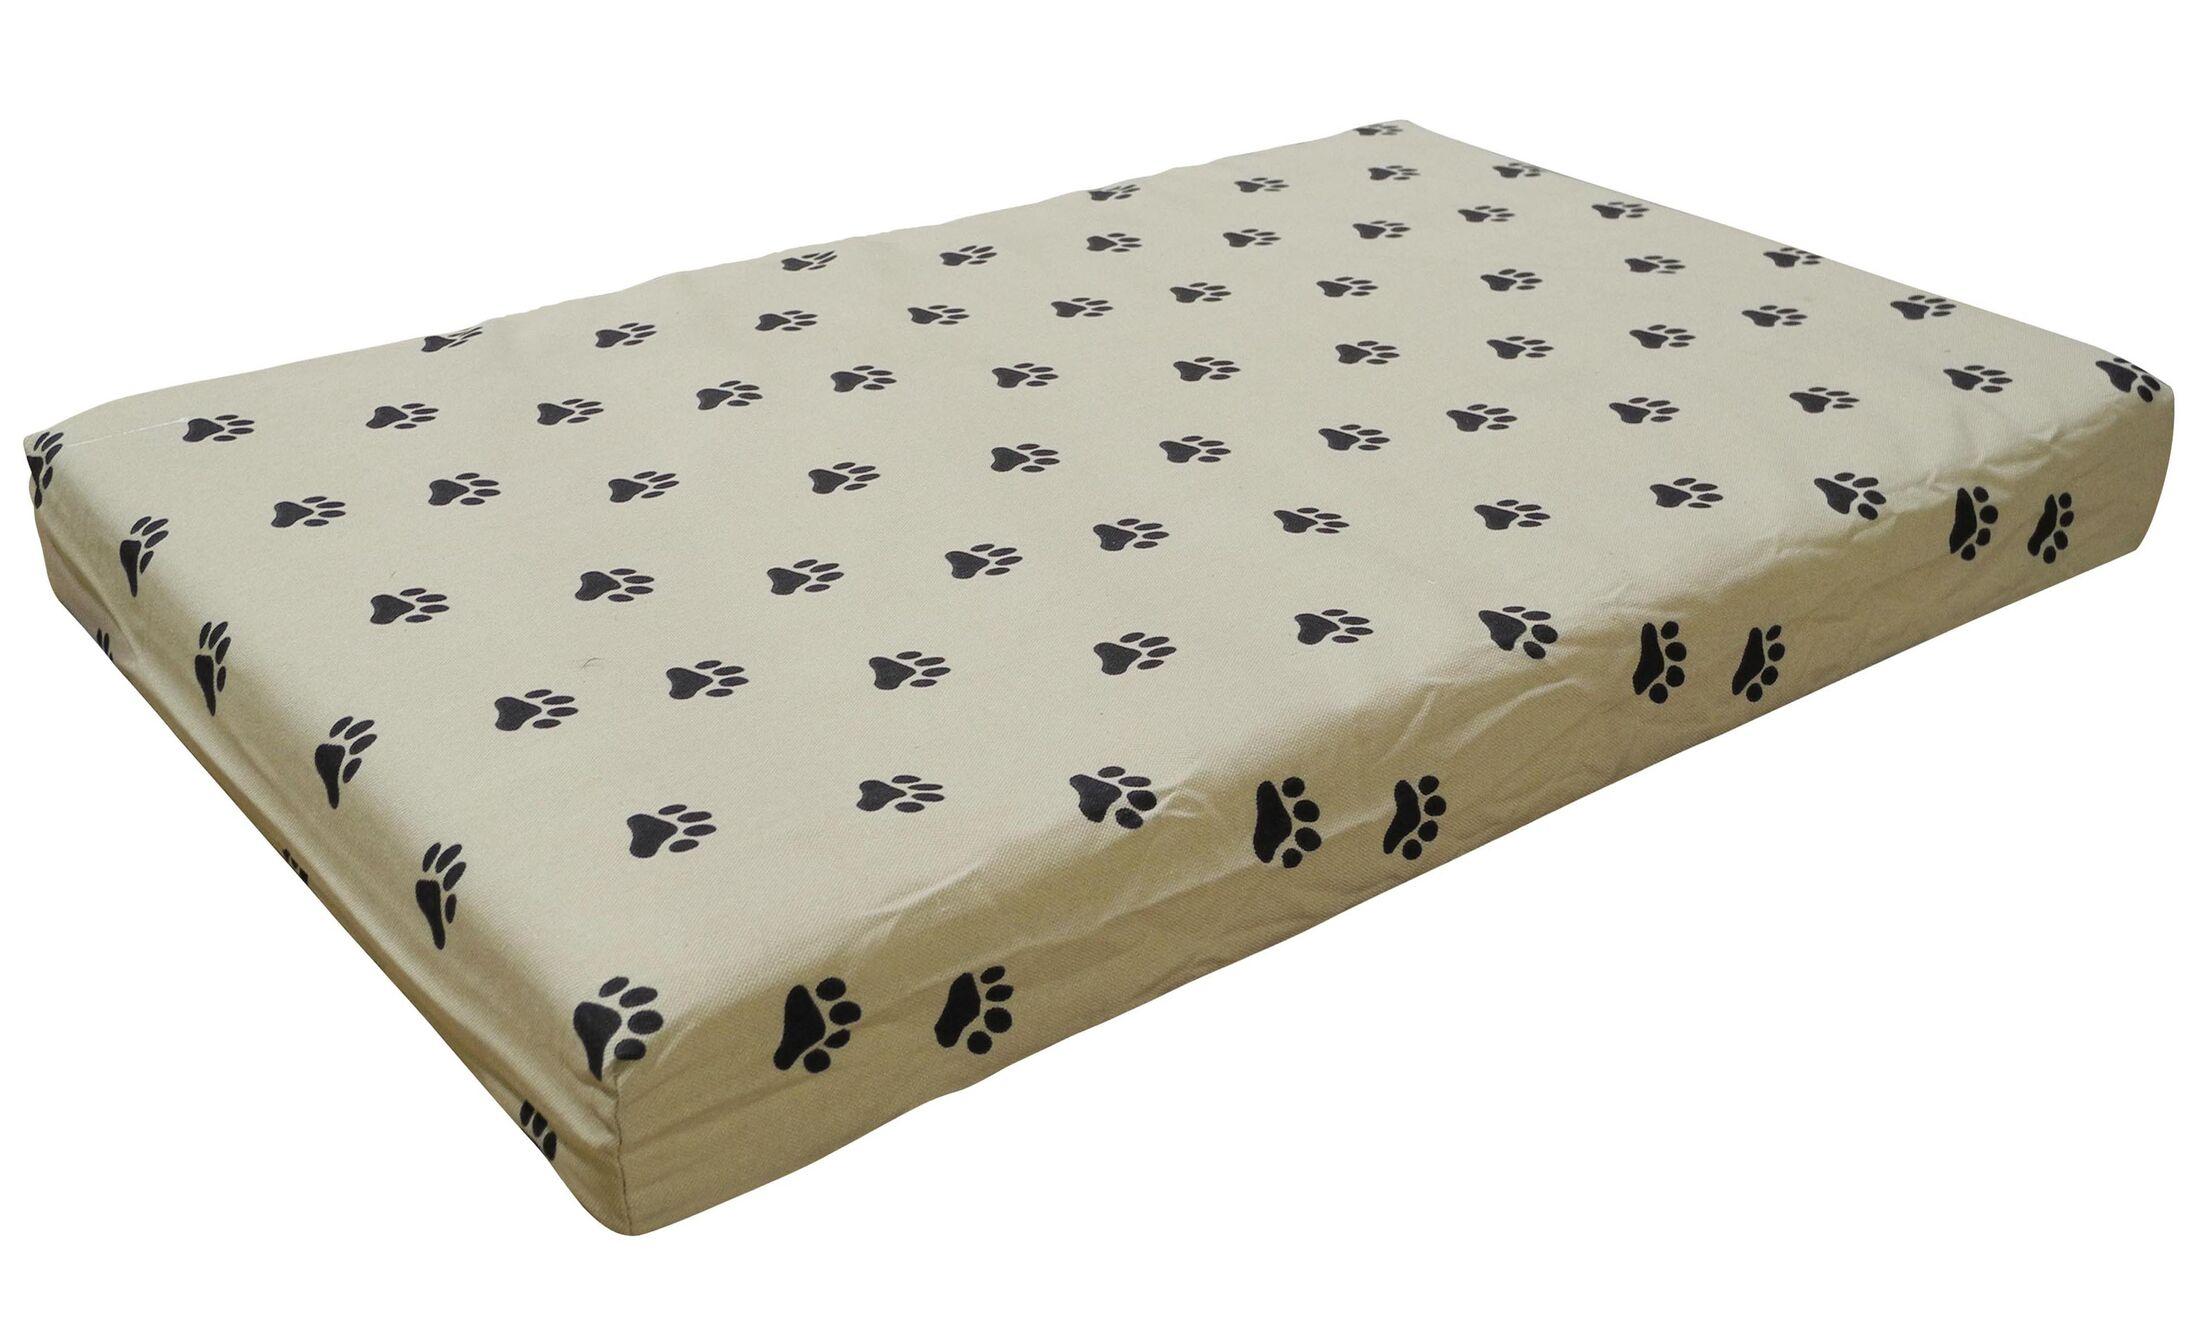 Memory Foam Orthopedic Pet Bed I Pillow/Classic Size: Medium - 40